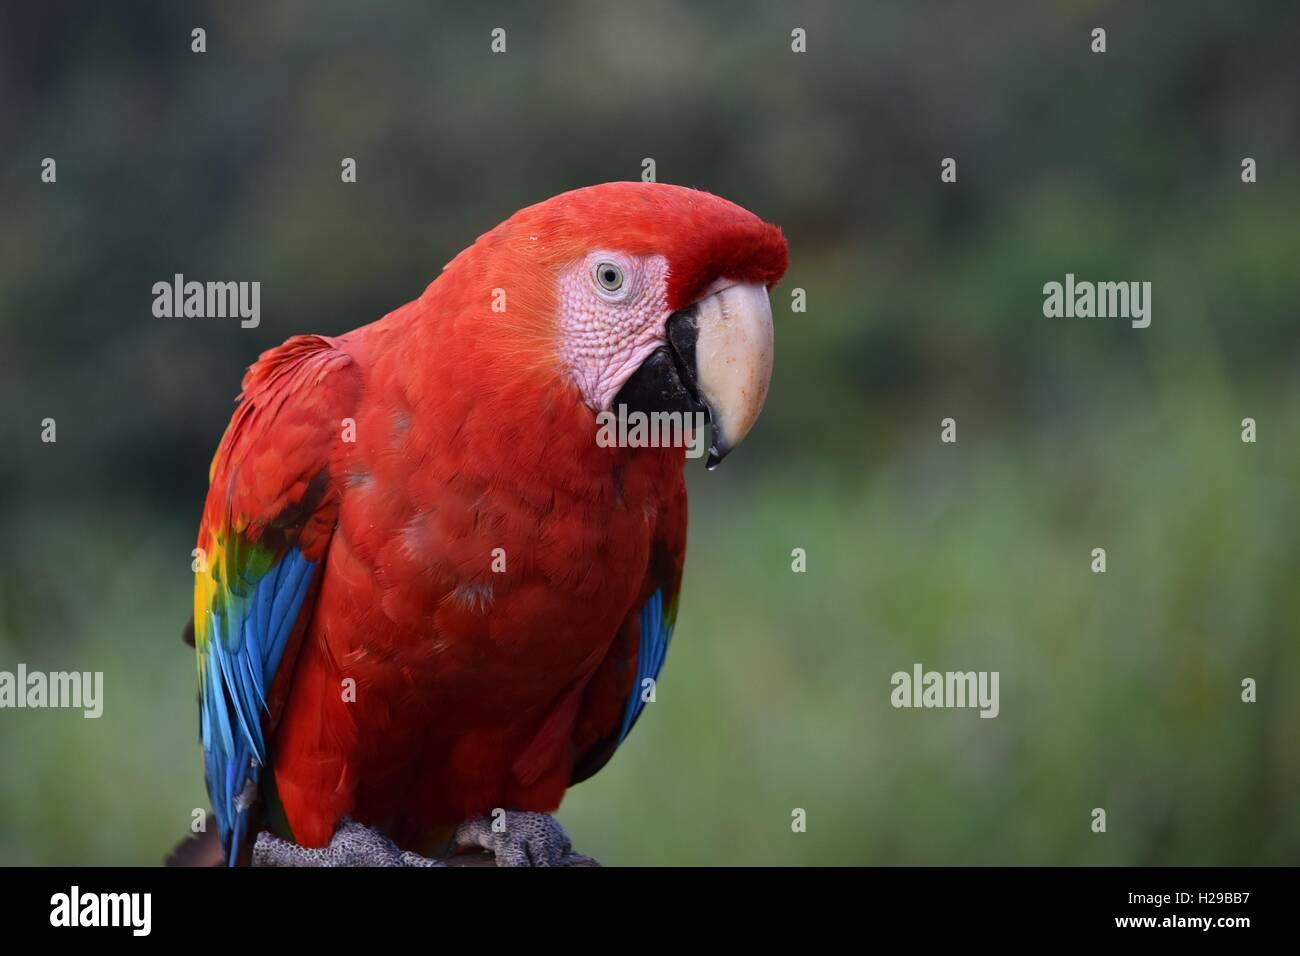 Parrot, Fauna, Flora, Jungle, Rain Forest, Manu, Peru - Stock Image